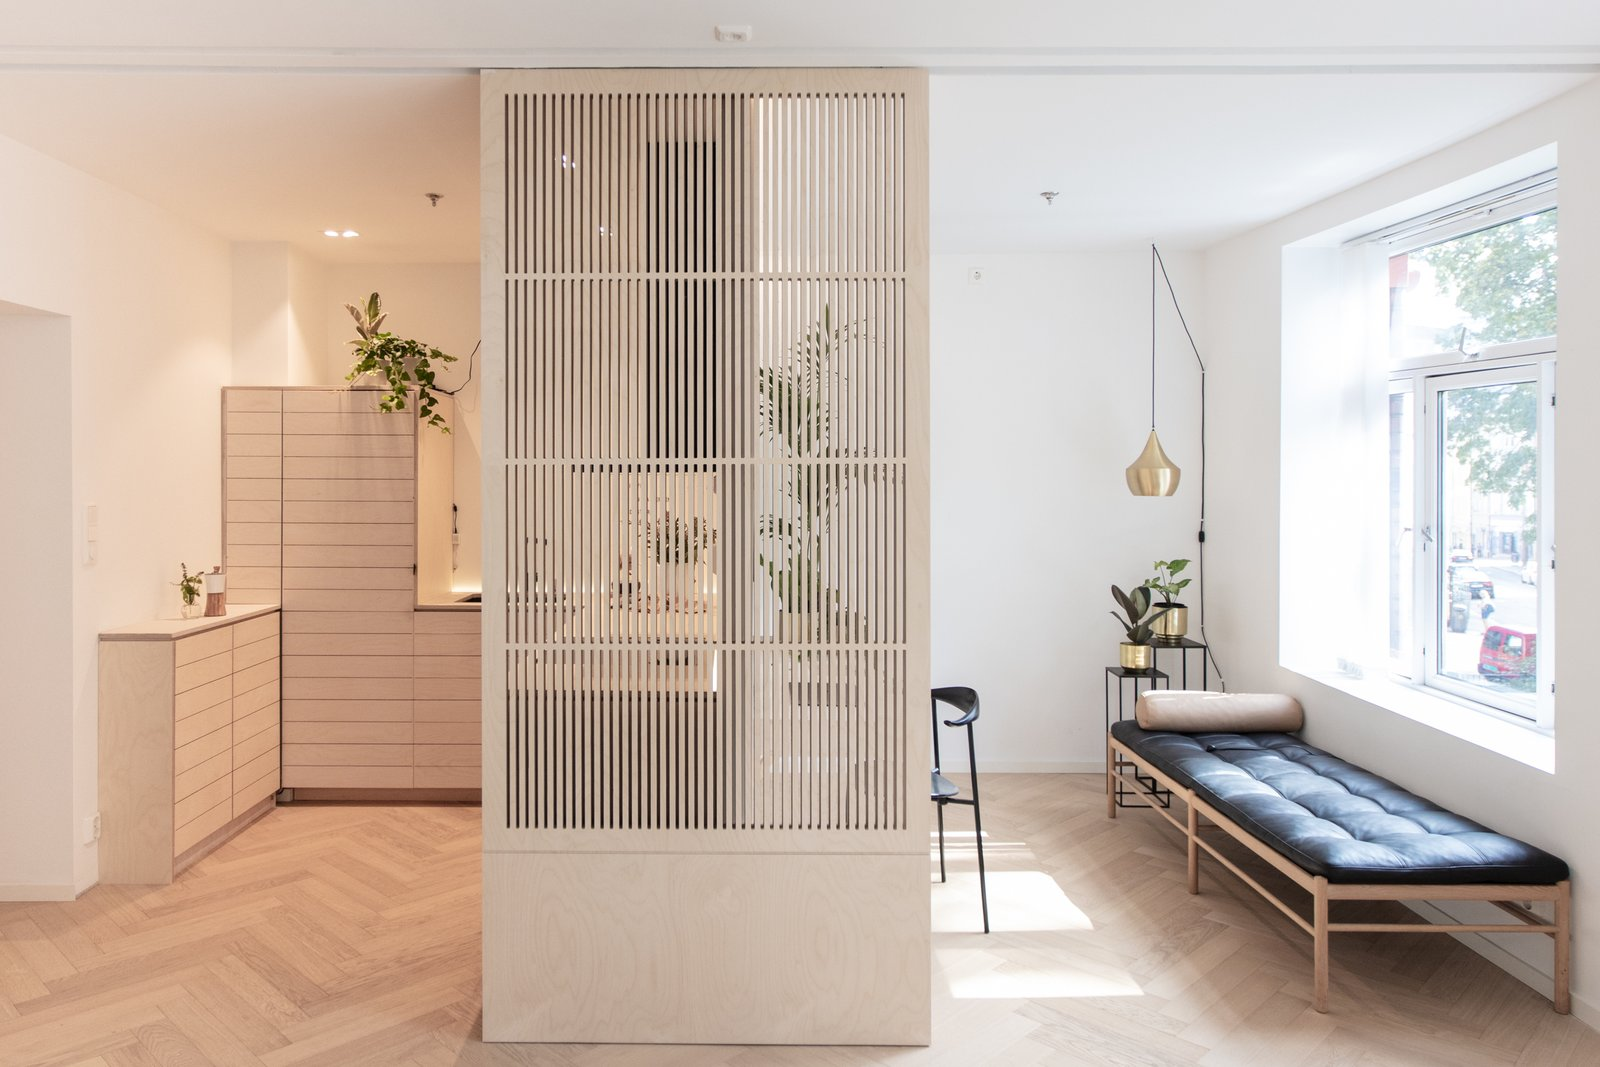 Doors, Interior, Wood, and Sliding Door Type Semi open both rooms, providing a more spacious open room.  Scandinavian/Japanese concept home in Oslo city center